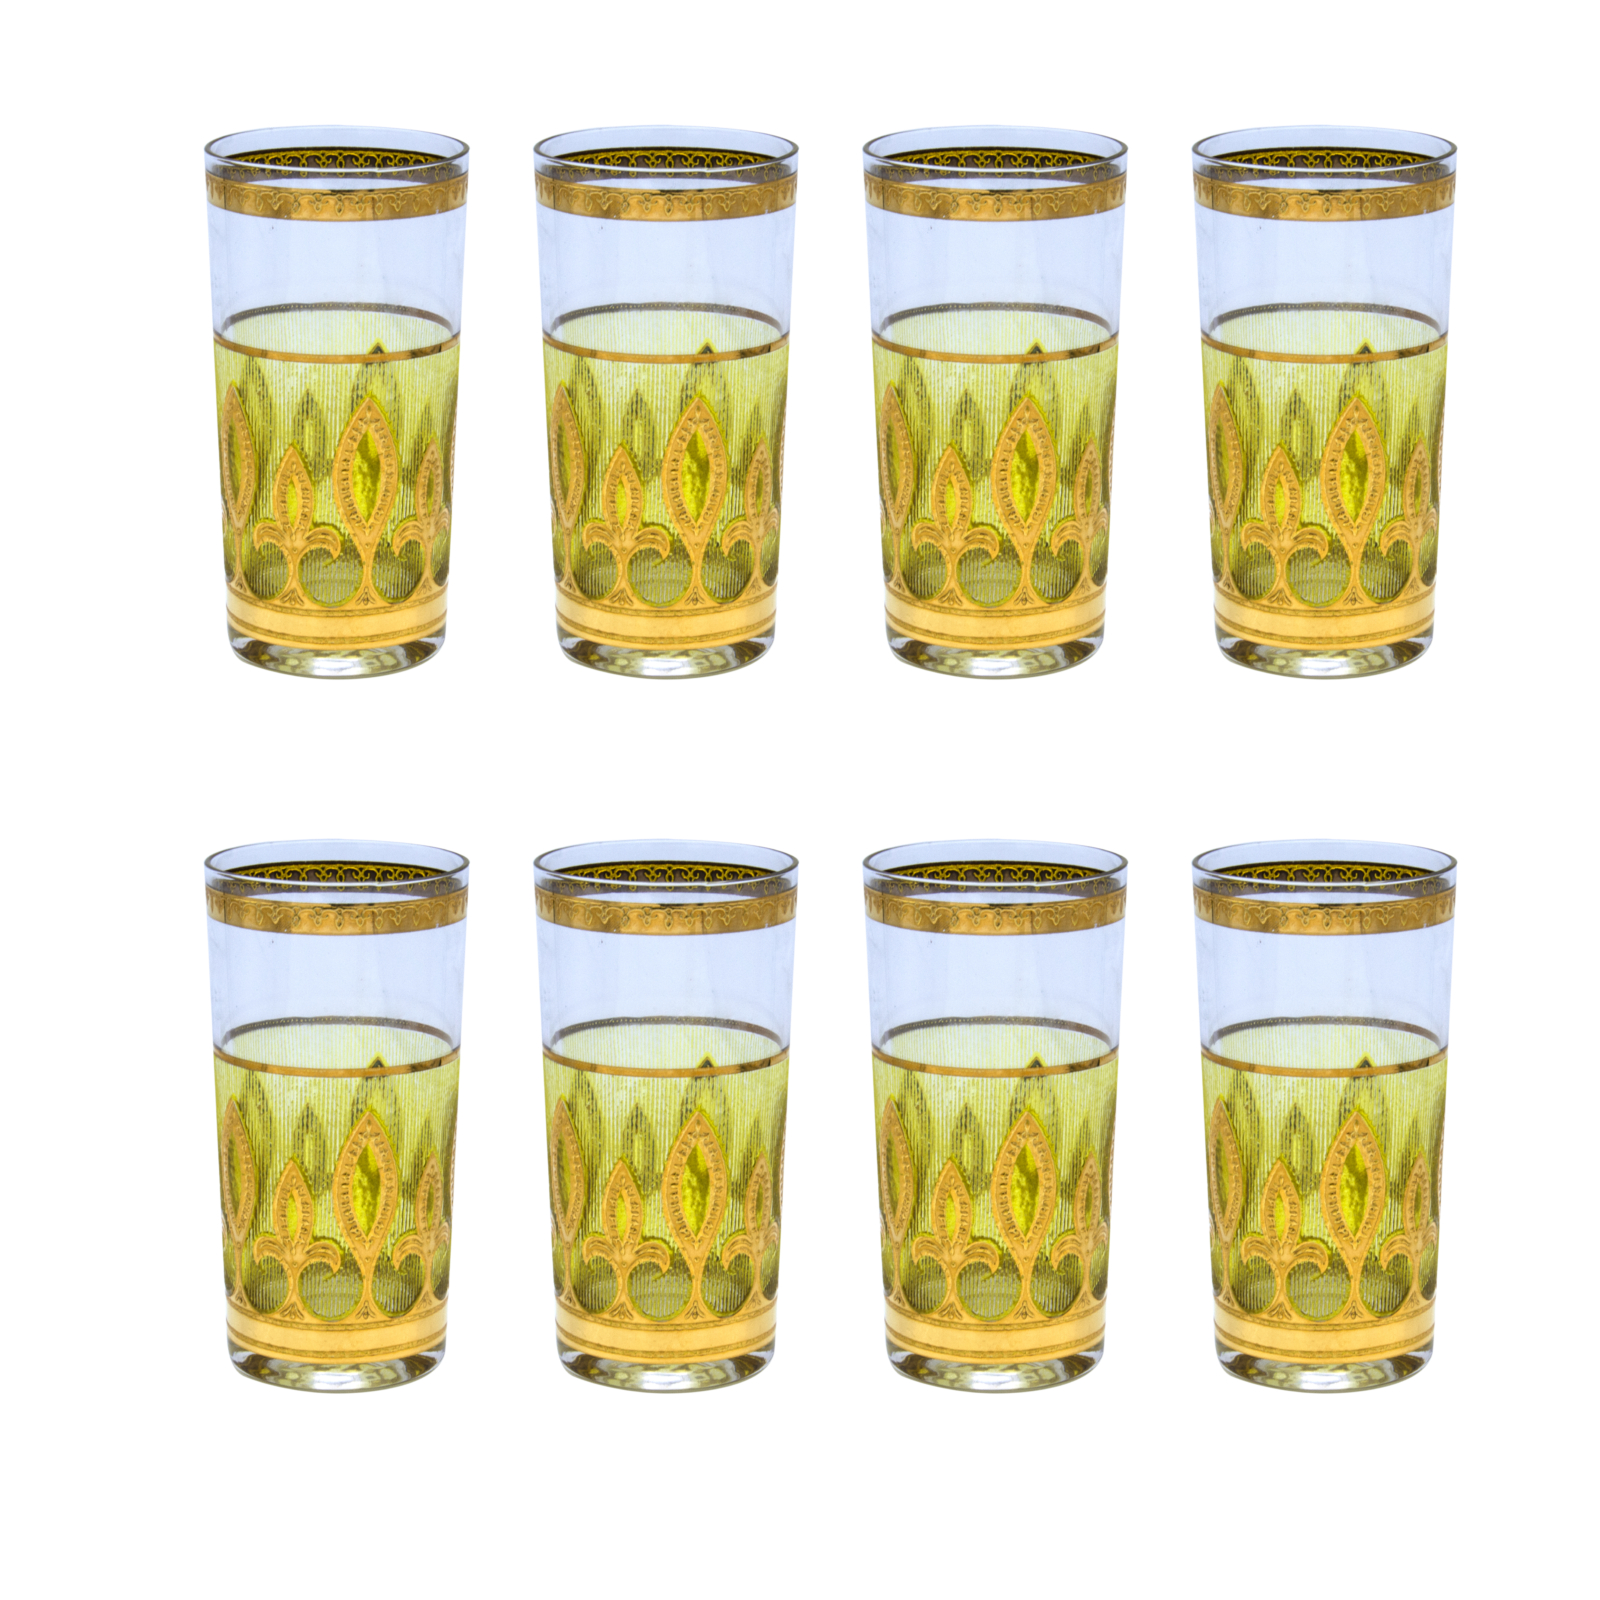 Culver Green & Gold Fleur de Lis Highball Glasses, Set of Eight (8)